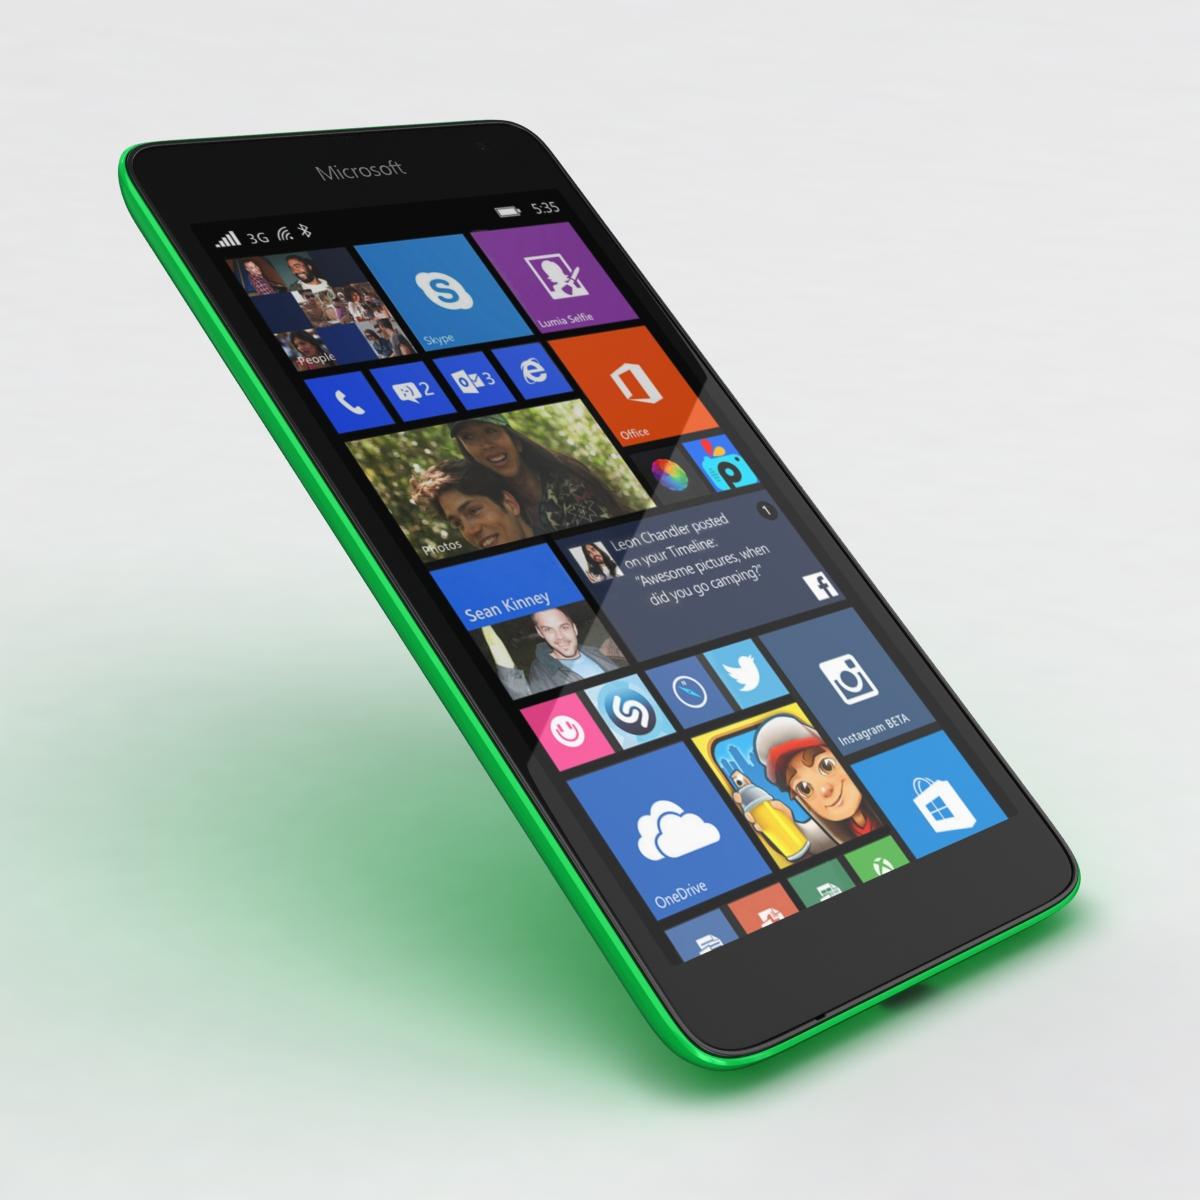 microsoft lumia 535 and dual sim green 3d model 3ds max fbx c4d obj 204181